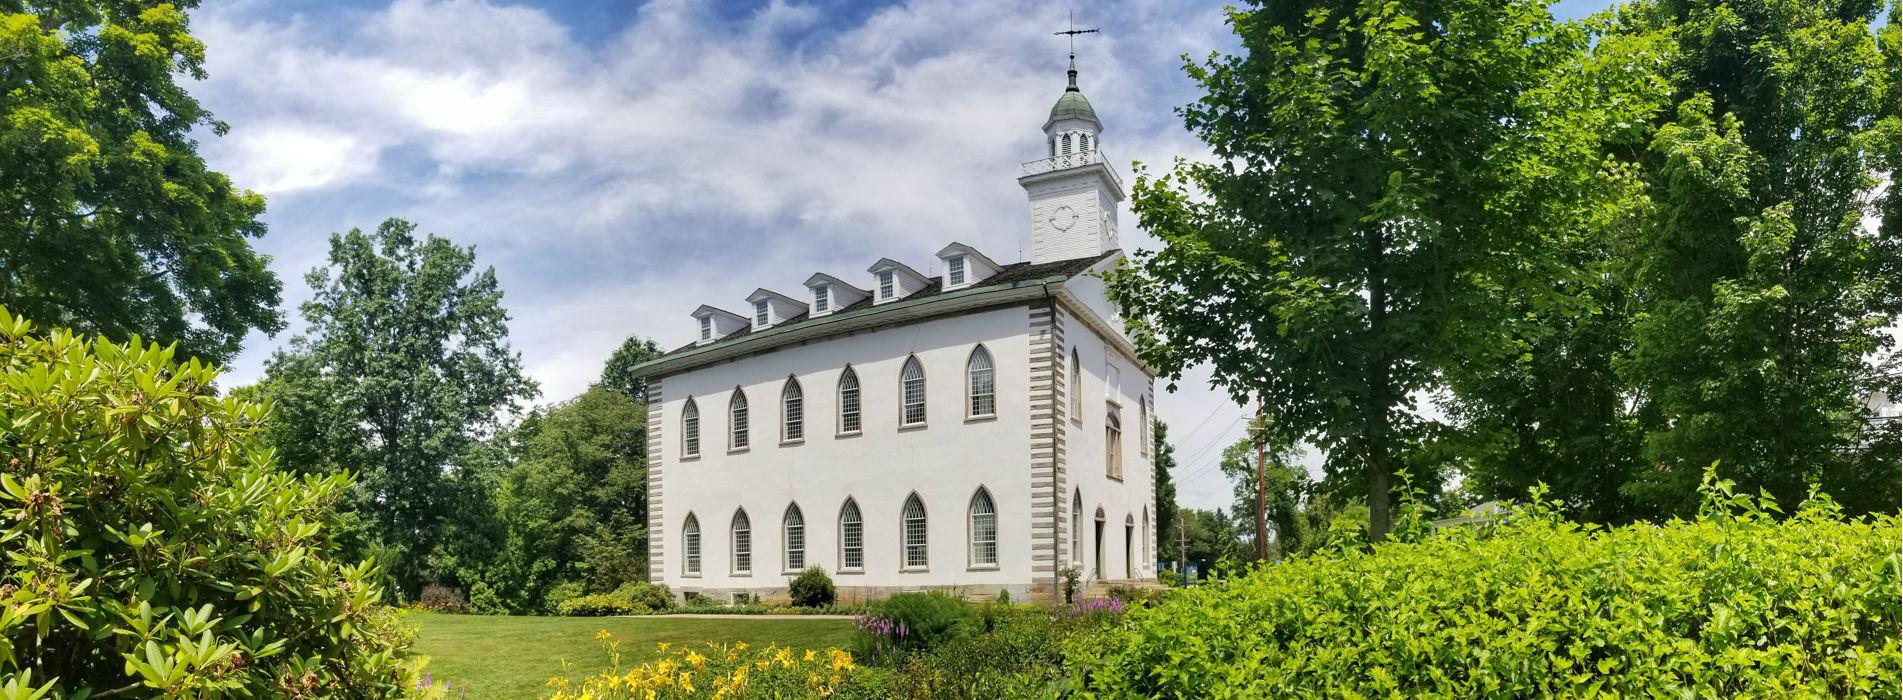 City of Kirtland Ohio Church